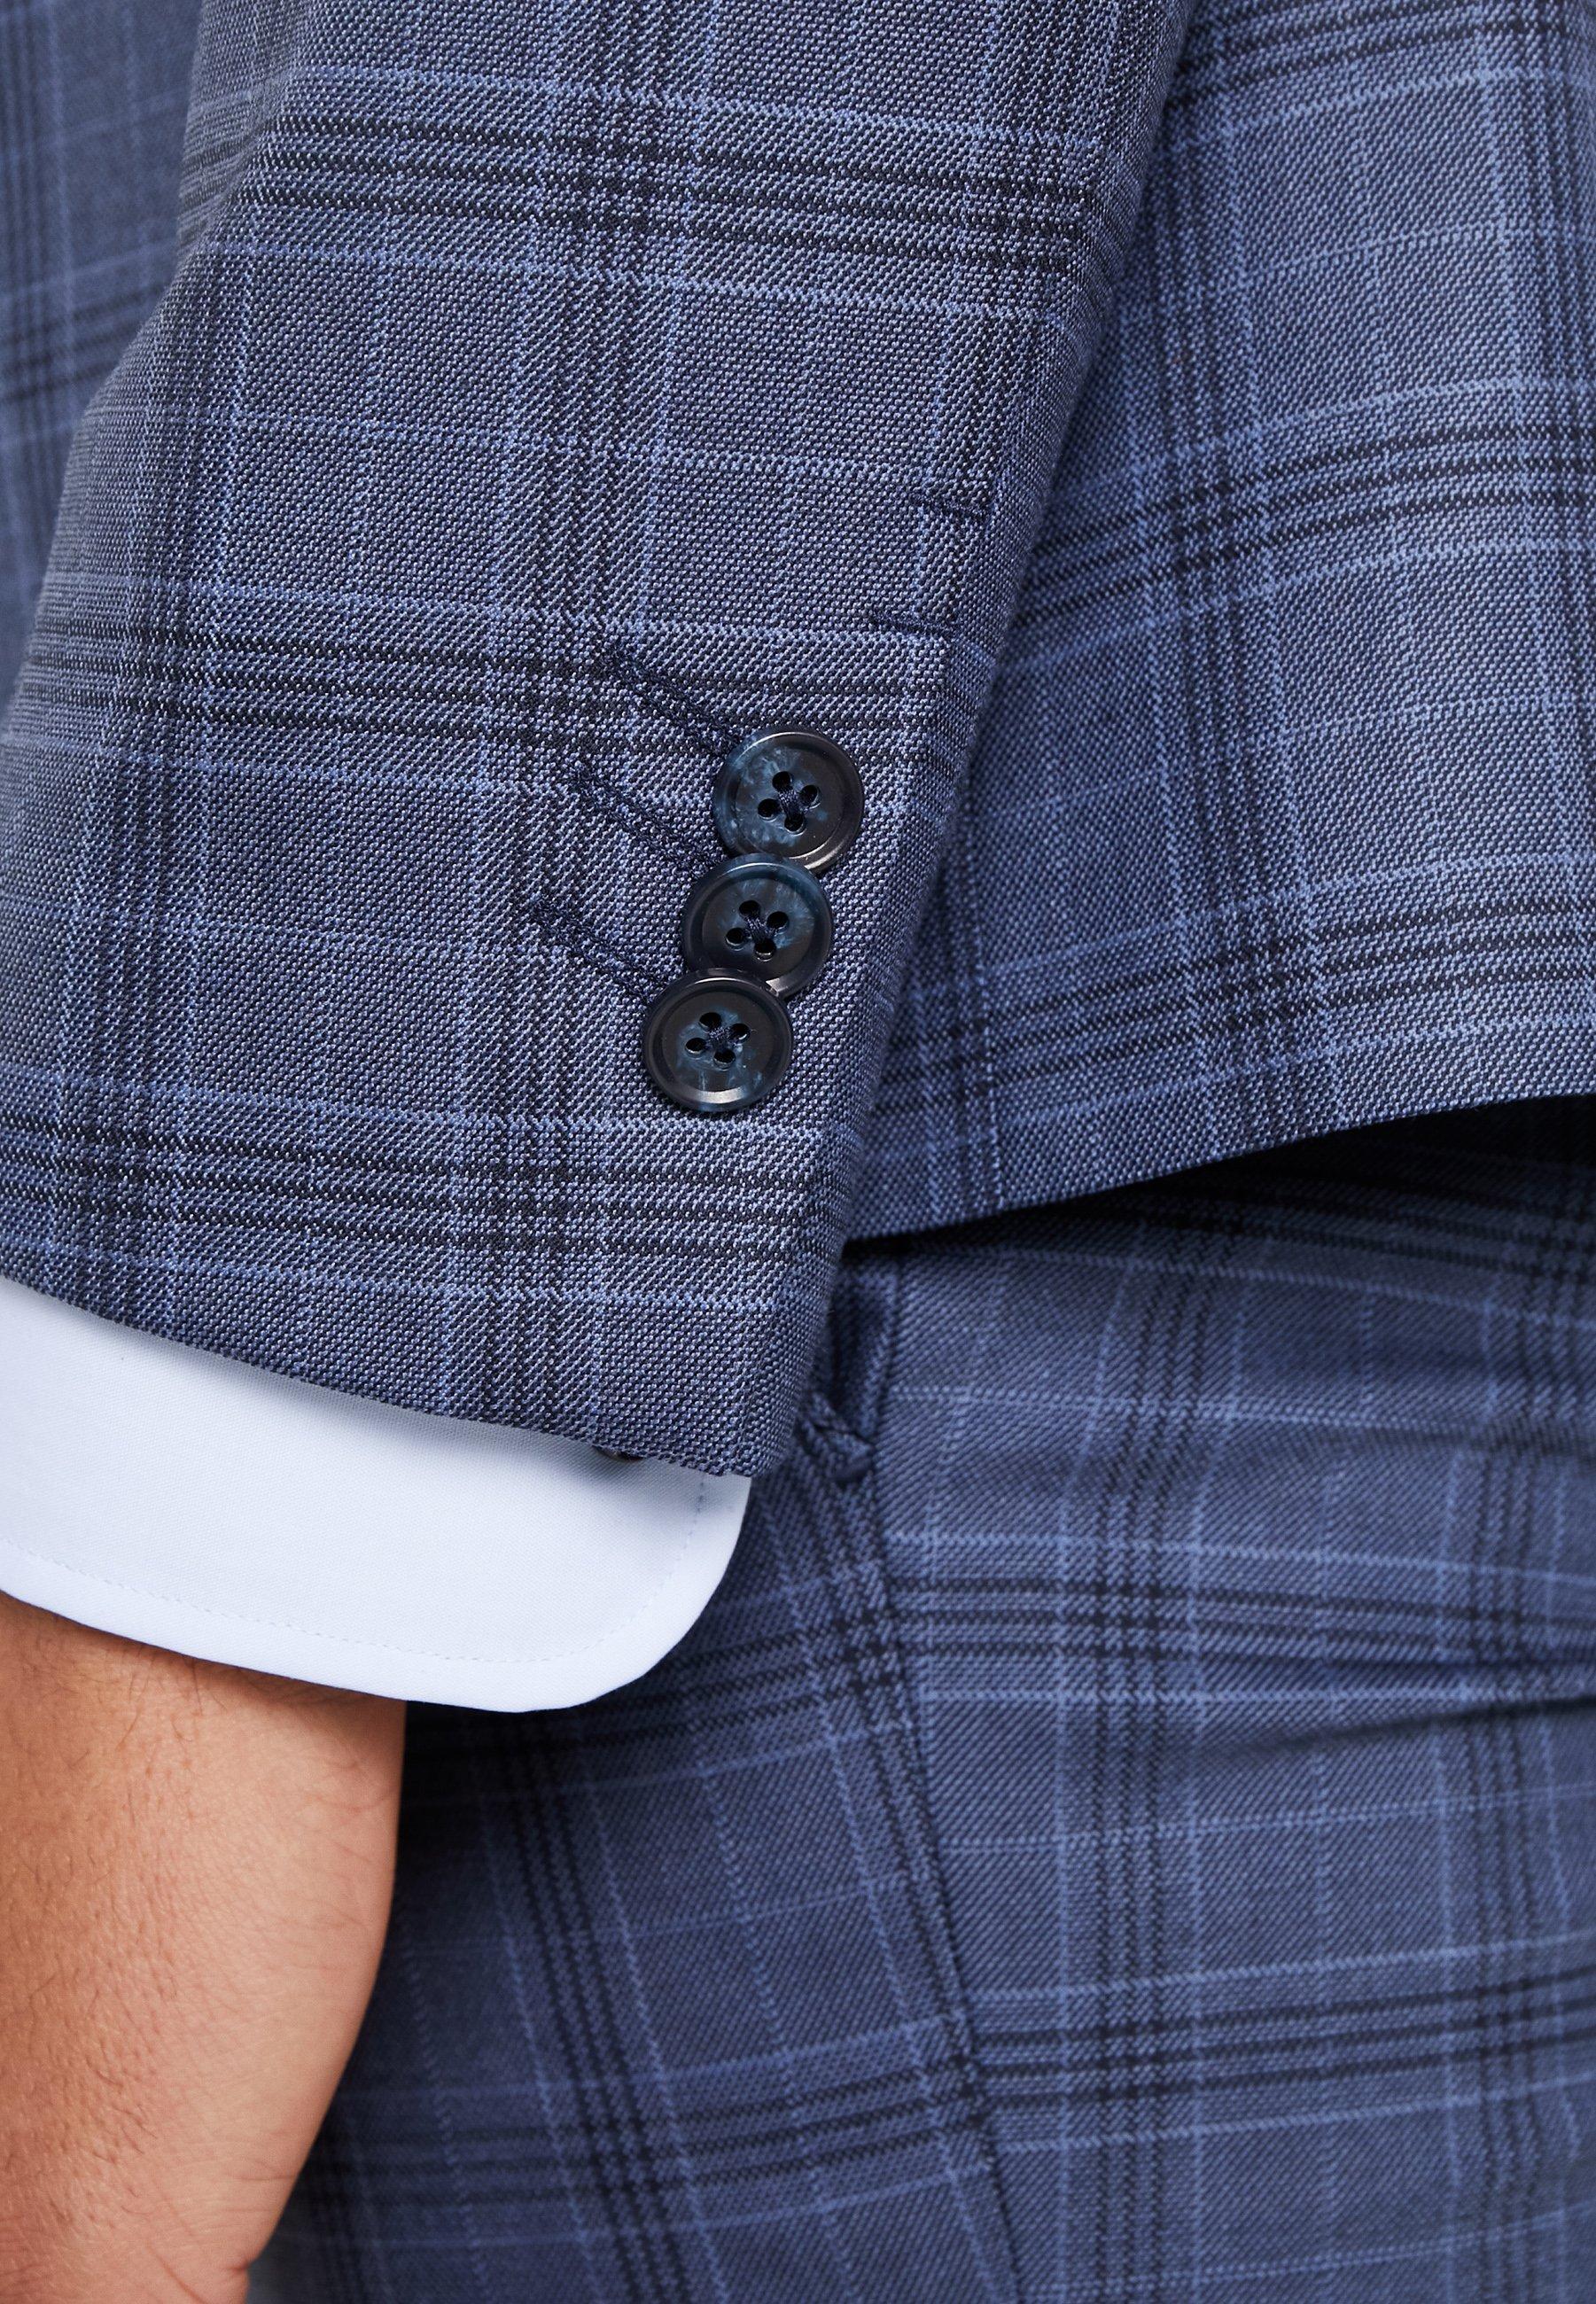 SuitCostume SuitCostume Svolvaer Viggo Viggo Blue Blue SuitCostume Blue Svolvaer Viggo Svolvaer Viggo 1JcuF3TlK